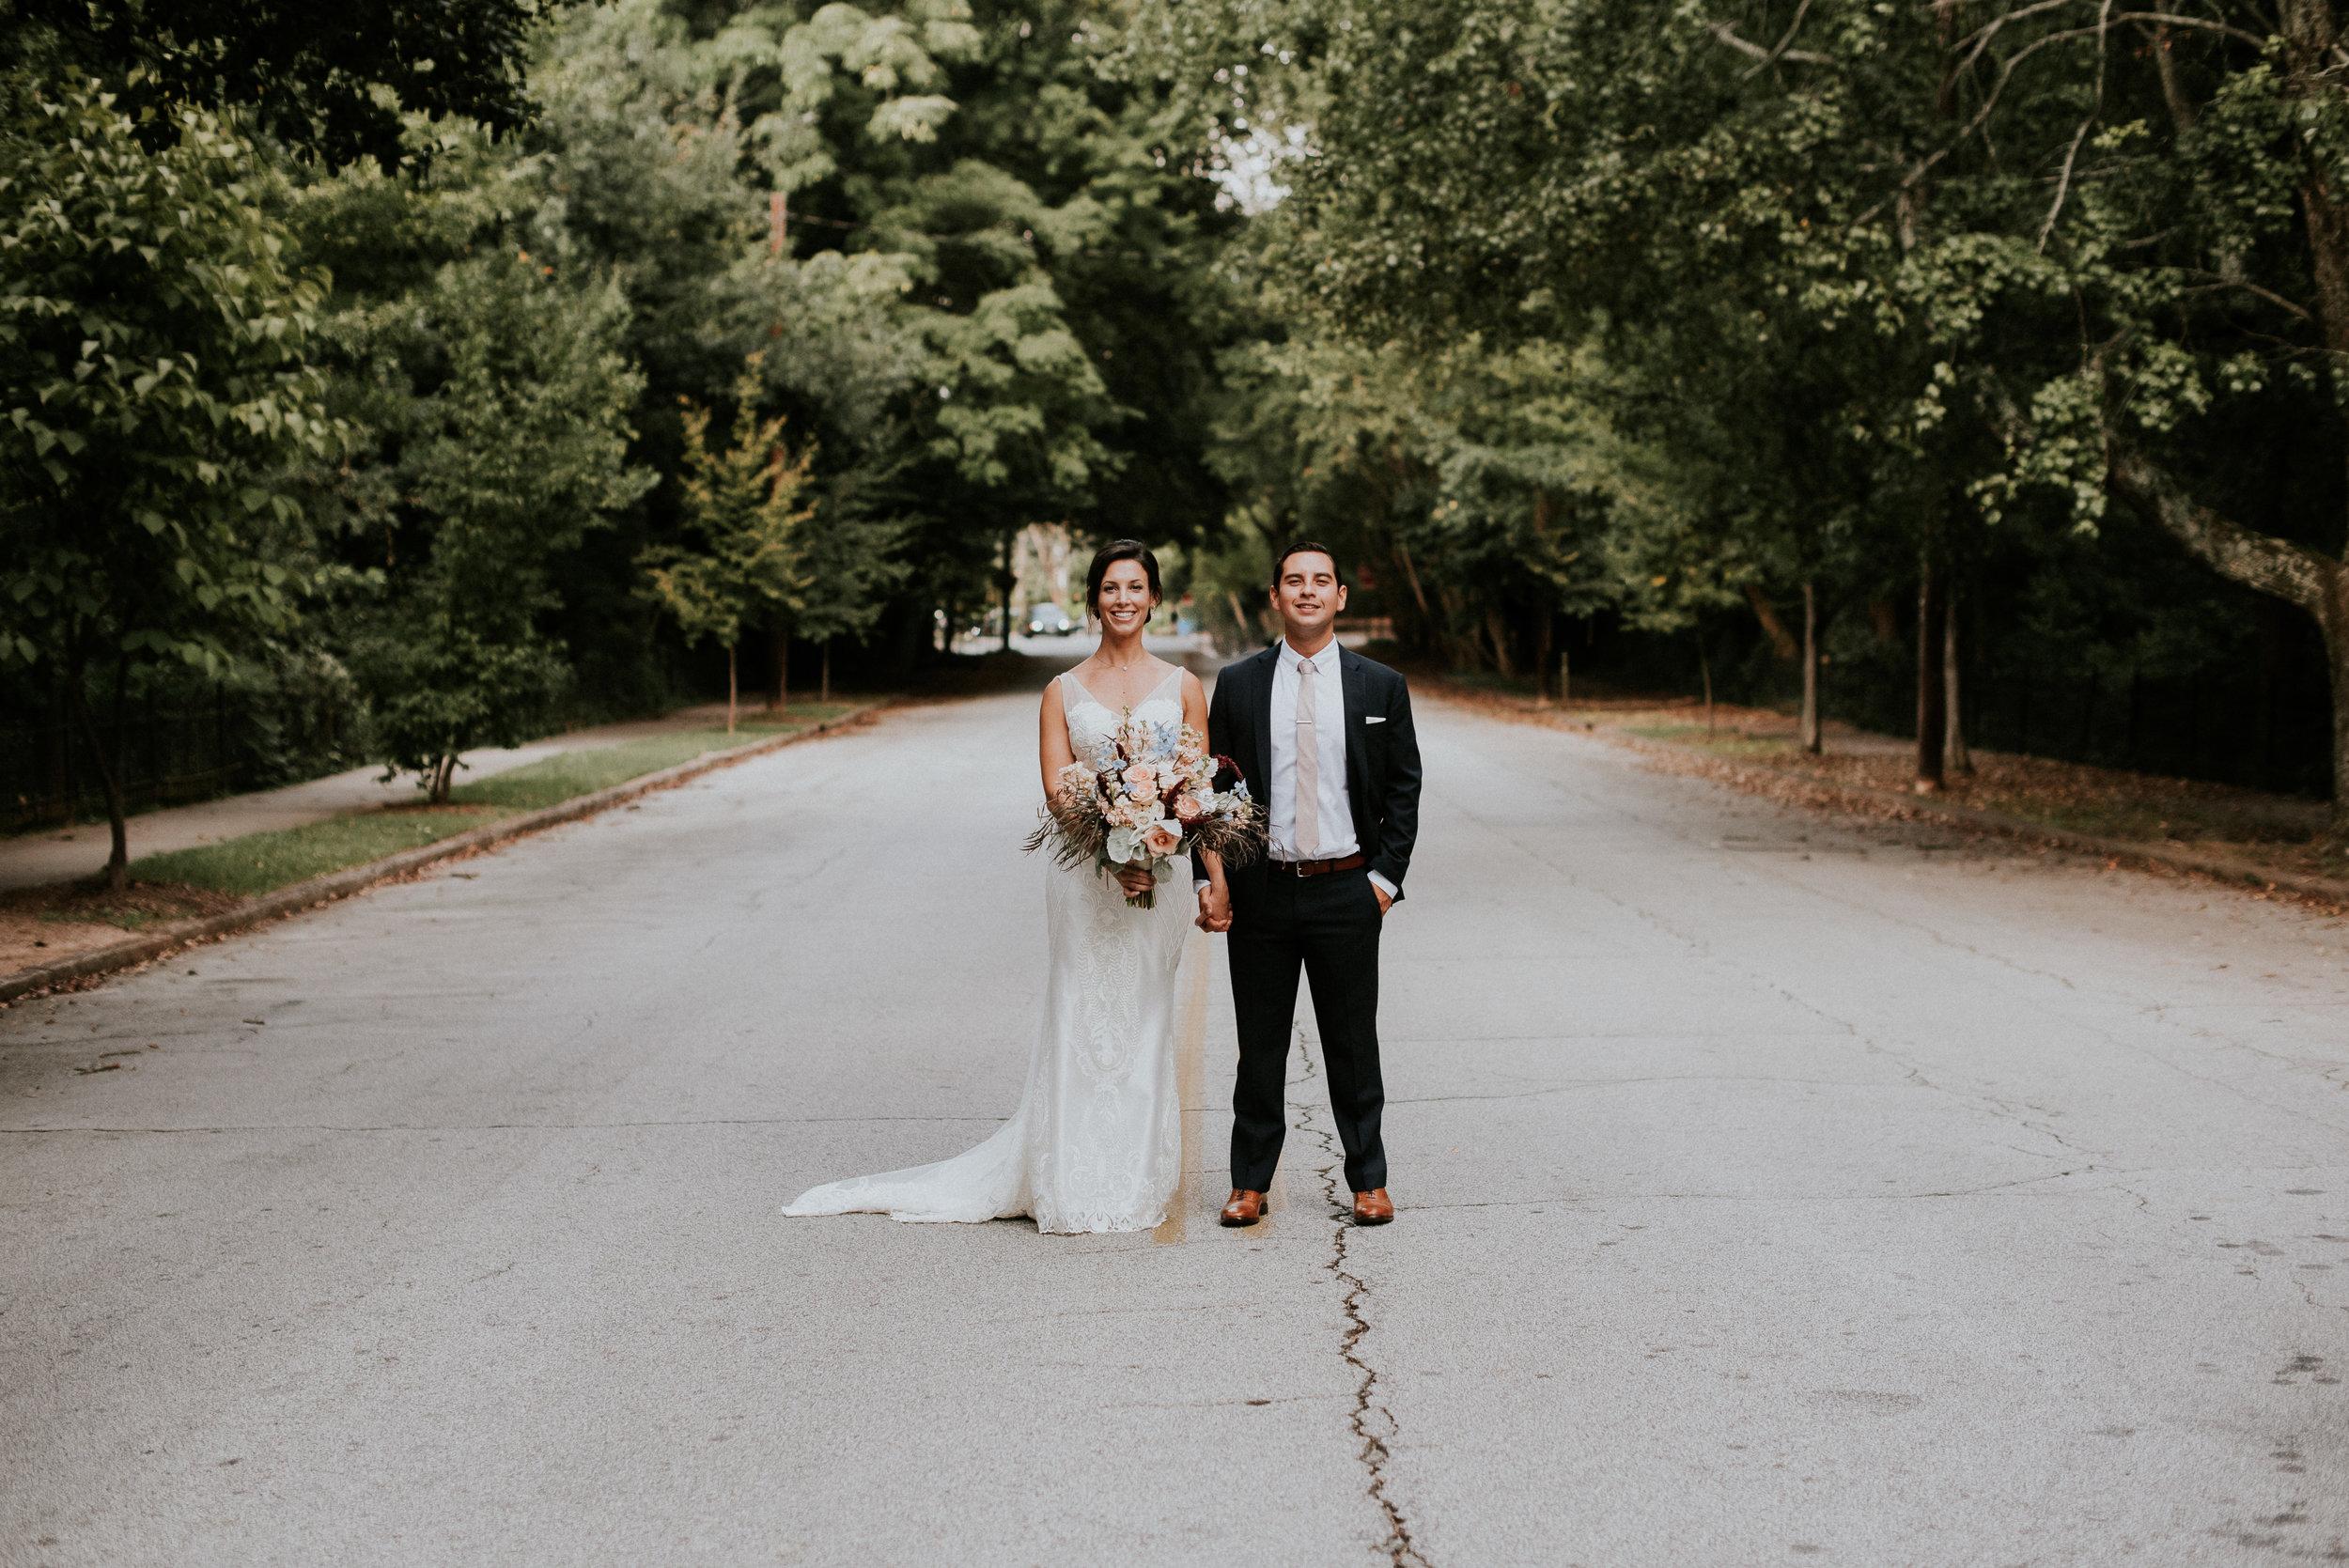 Bride and groom portrait at The Trolley Barn in Atlanta, GA